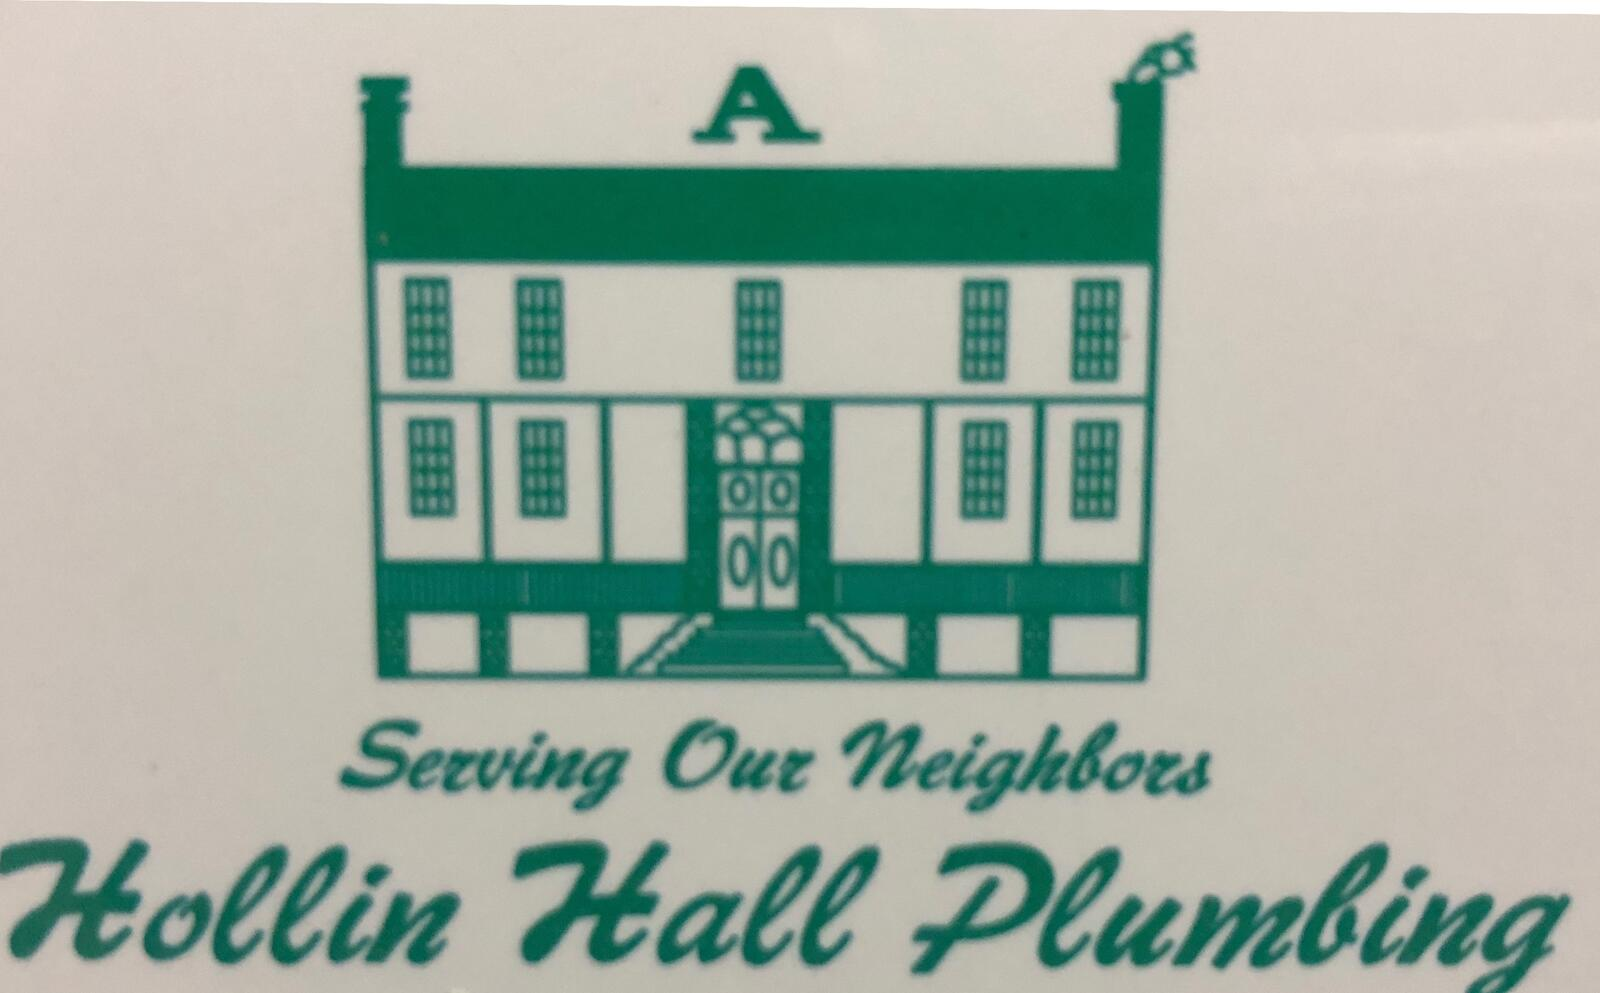 Lovely Hollin Hall Plumbing